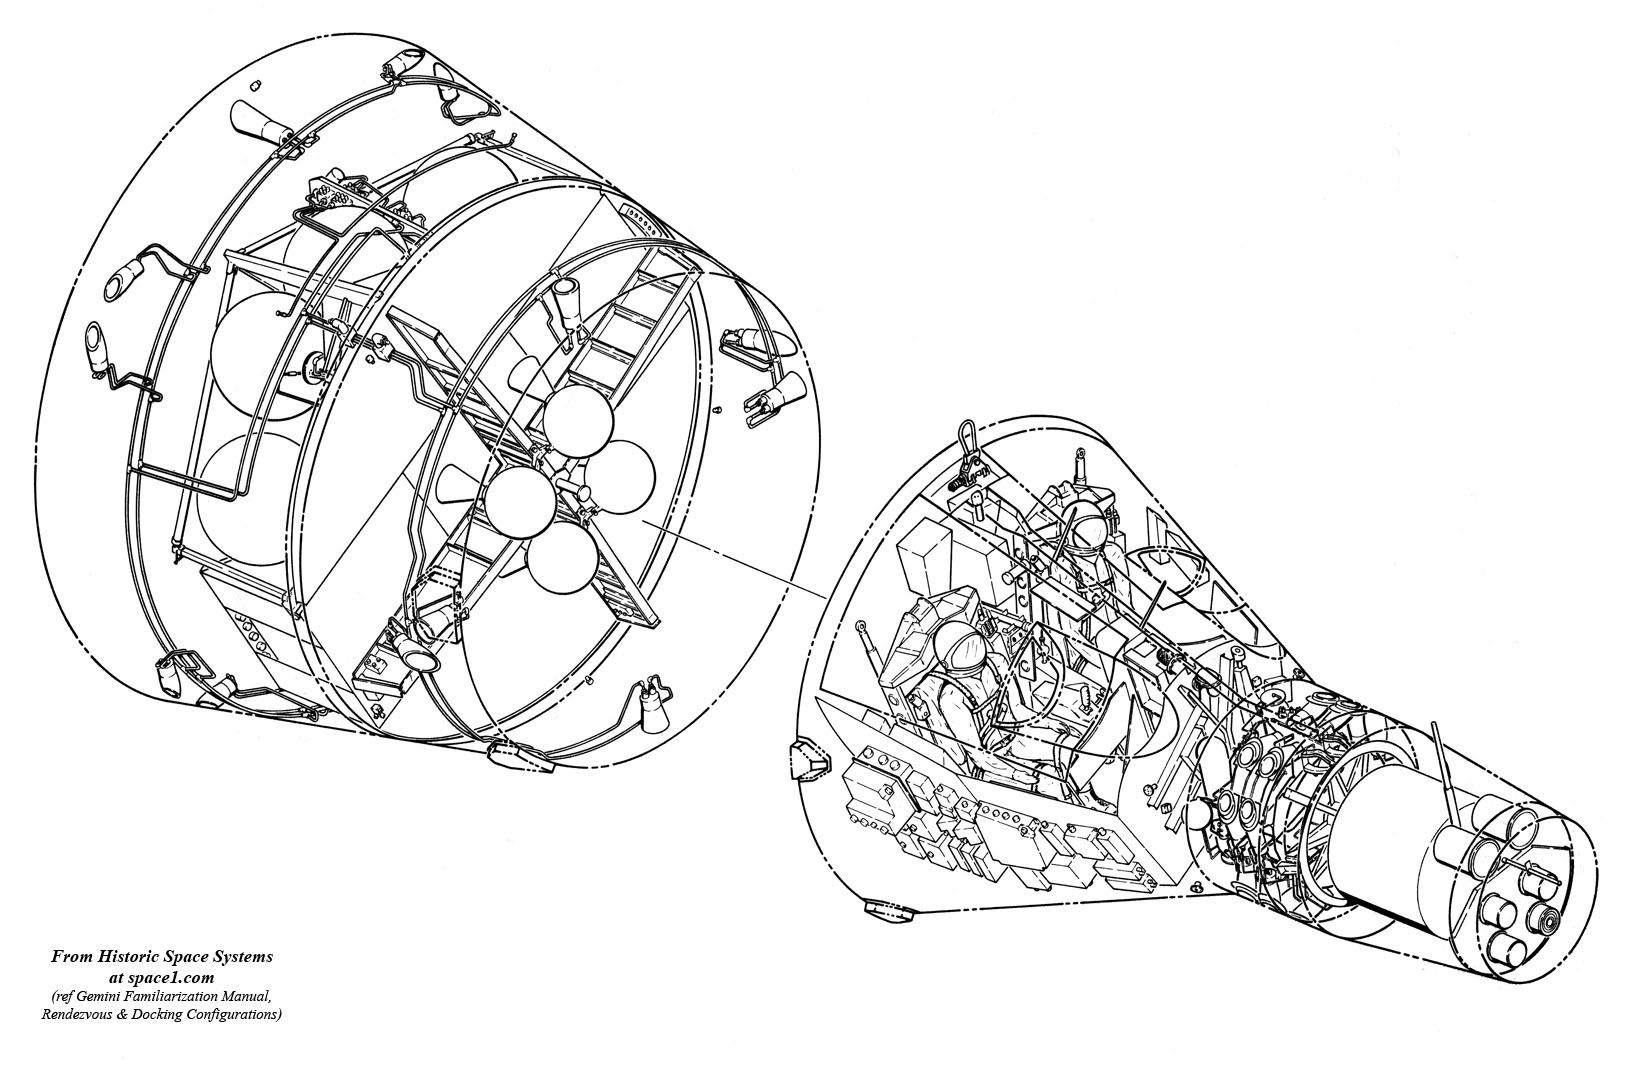 Gemini spacecraft cutaway (from Gemini Familiarization